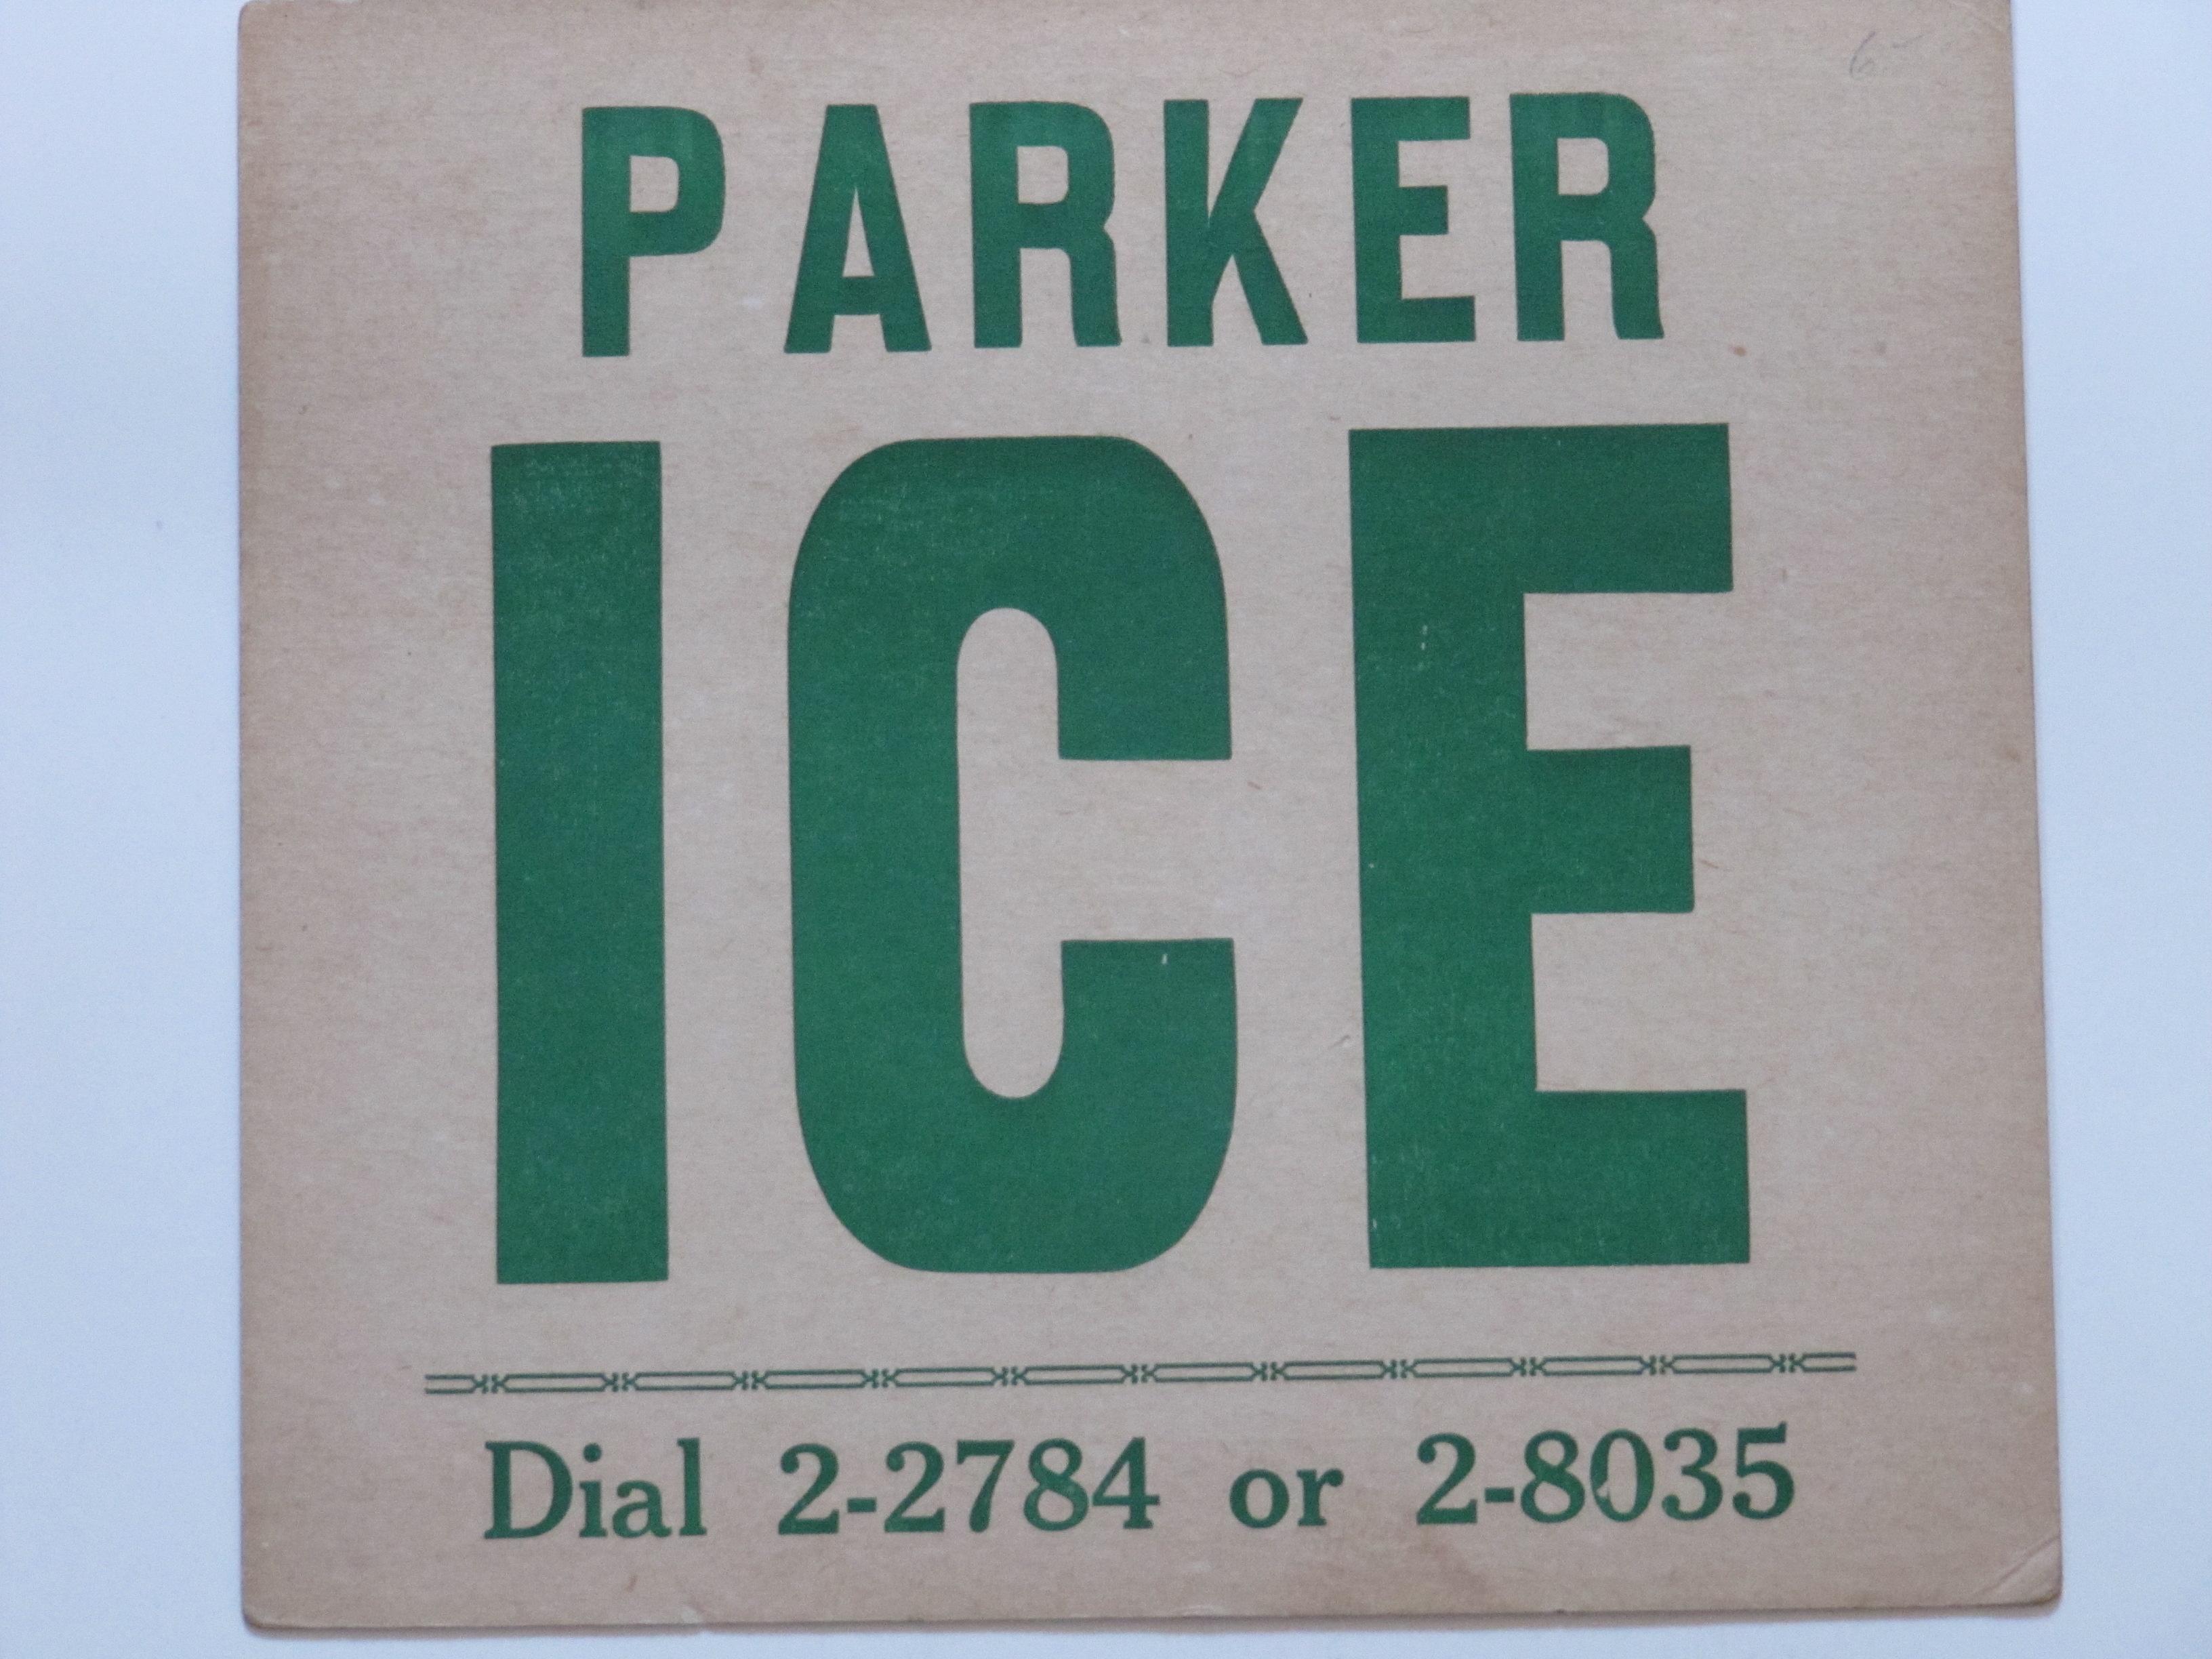 Parker Ice